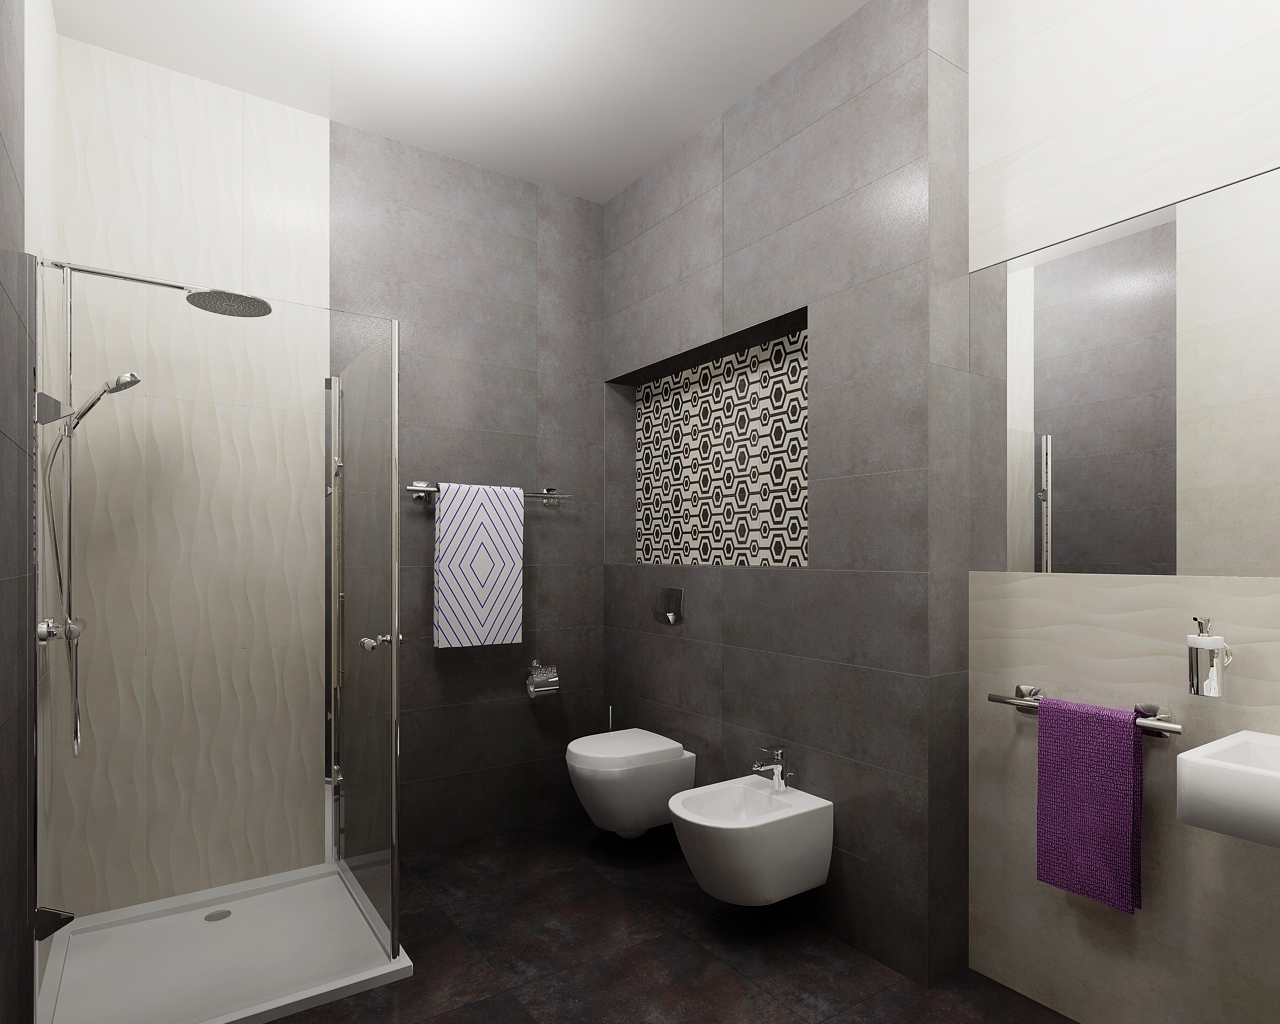 aparici bathroom by kirill dvurechenskiy asdom on visoft360 portal. Black Bedroom Furniture Sets. Home Design Ideas